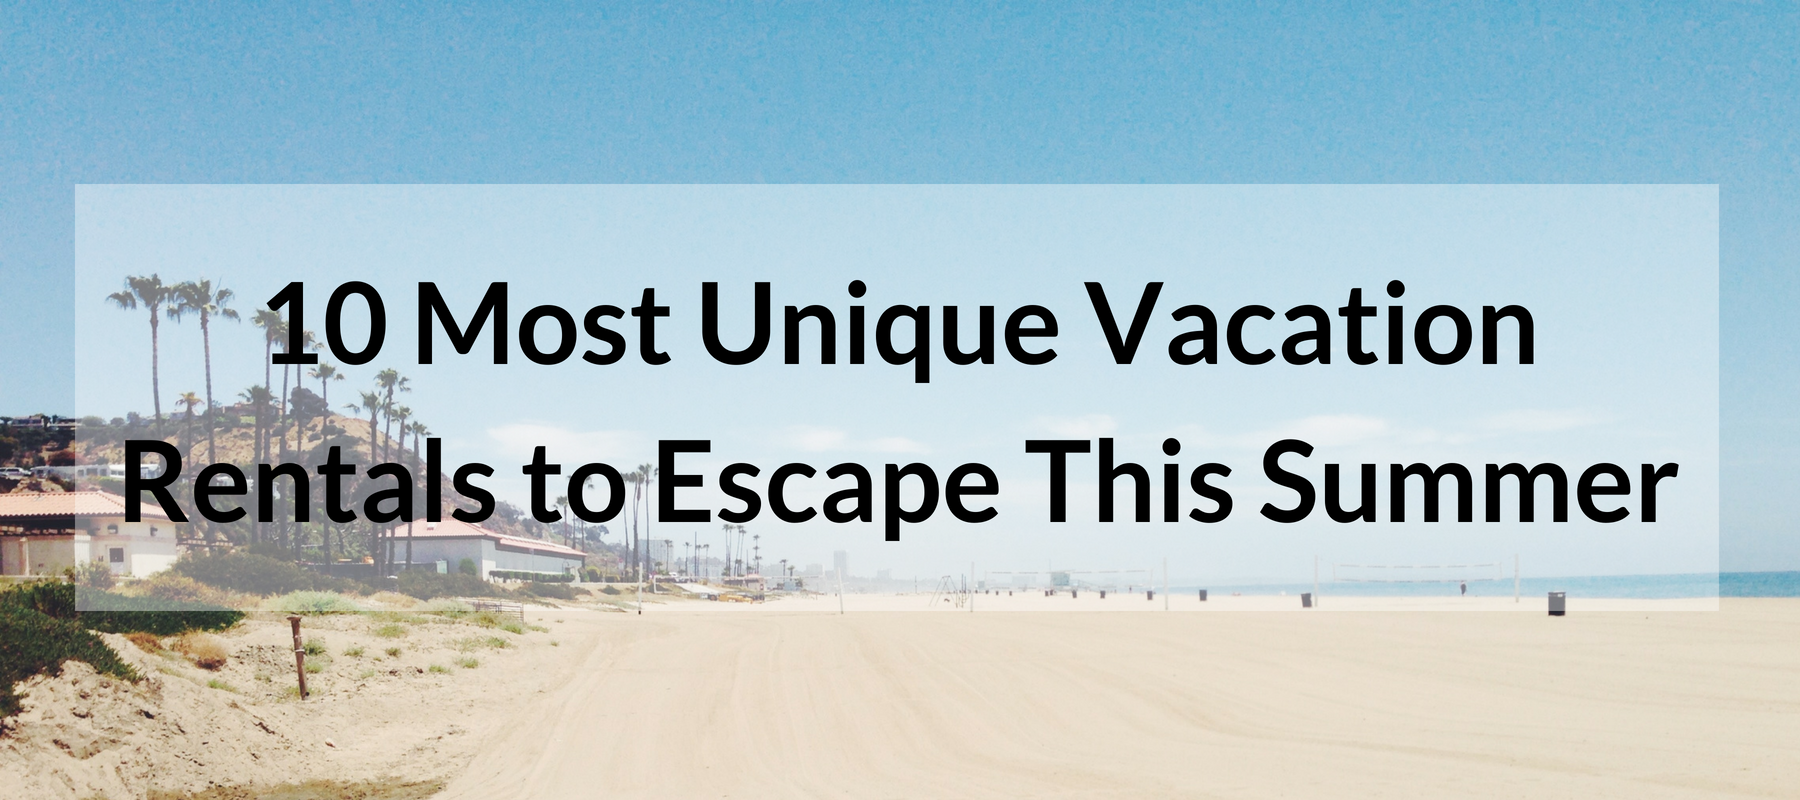 10 Most Unique Vacation Rentals to Escape This Summer